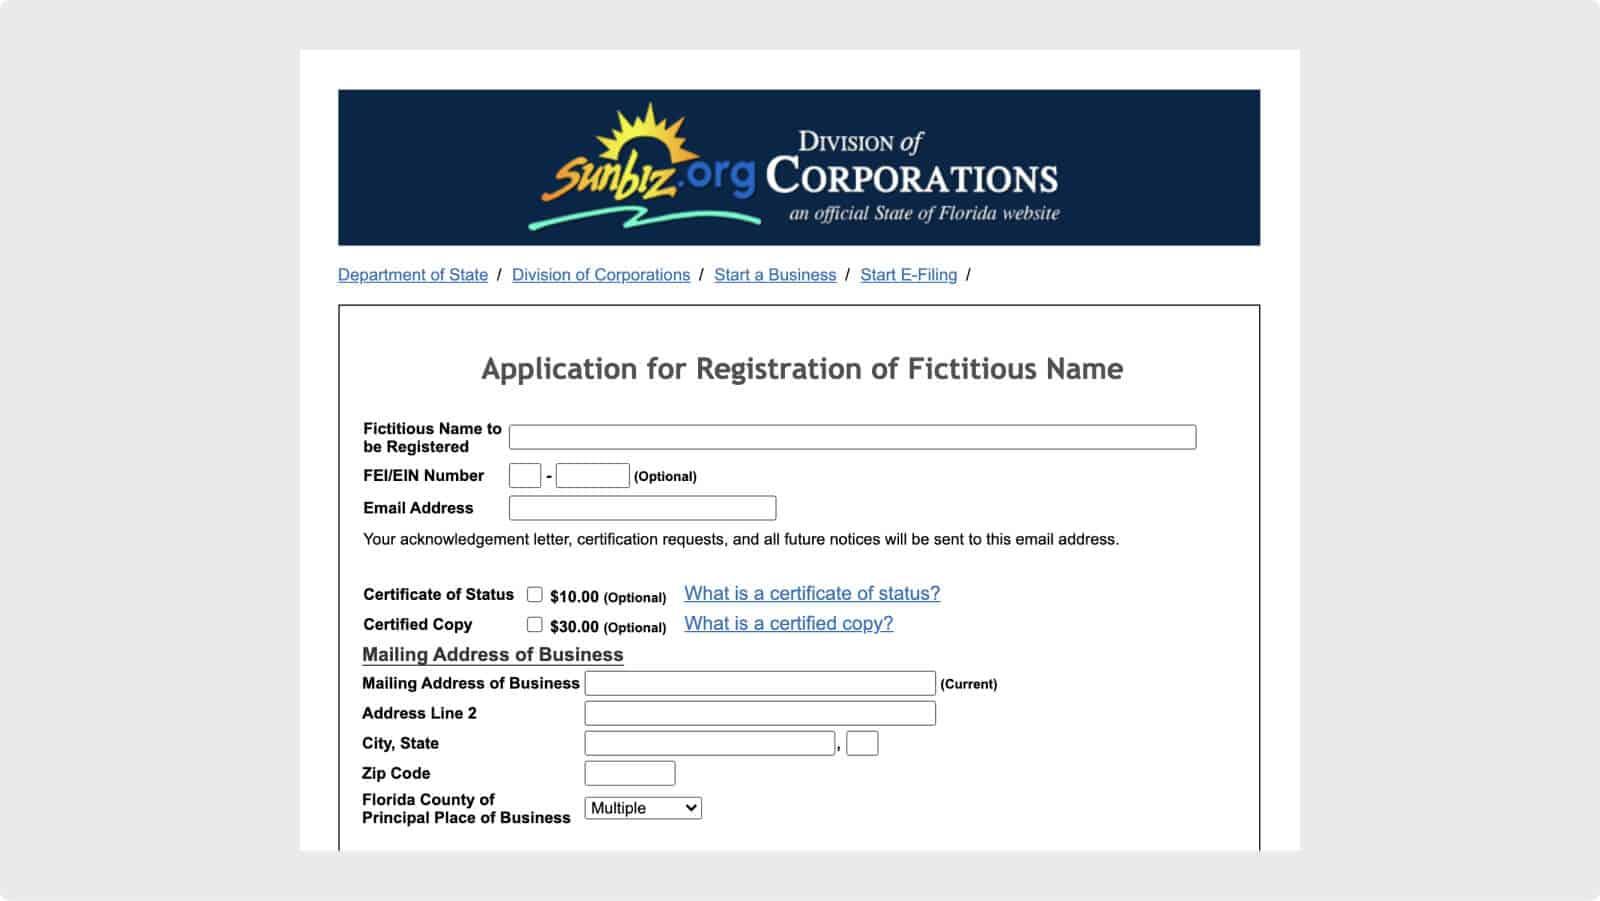 Florida Sunbiz Fictitious Name Registration